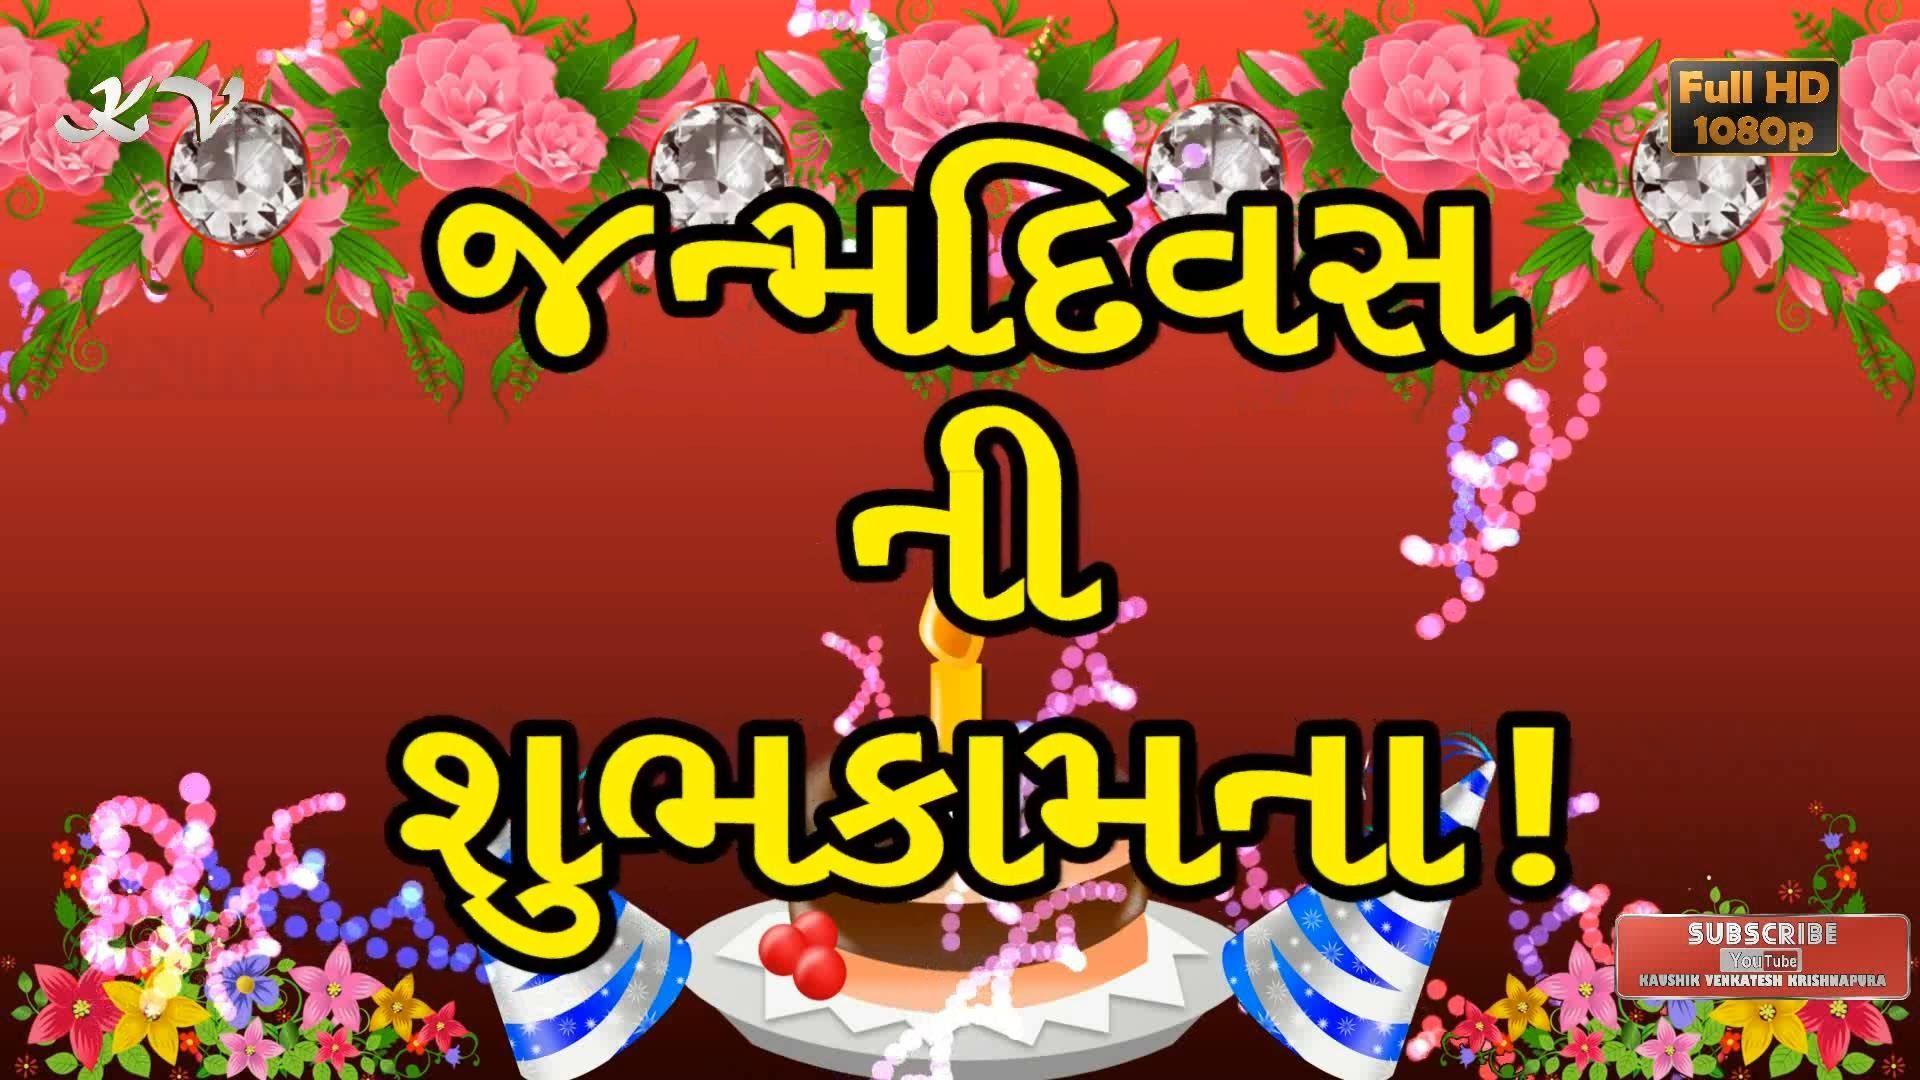 Gujarati Birthday Wishes, Happy Birthday Greetings in